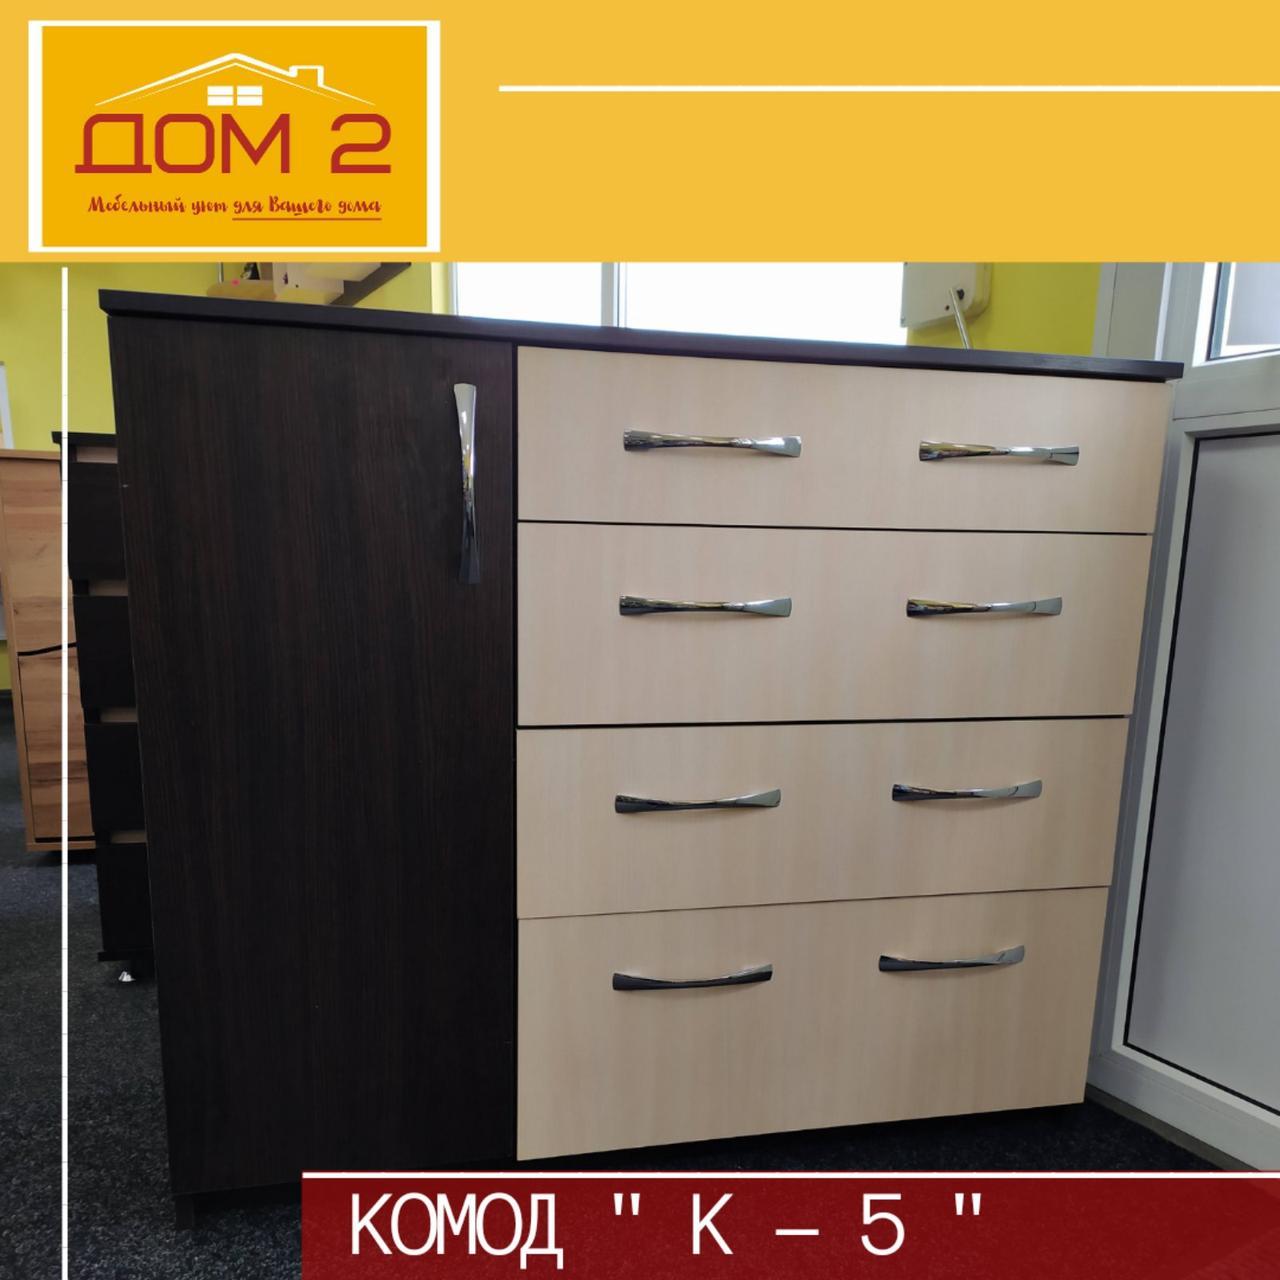 Комод К - 5